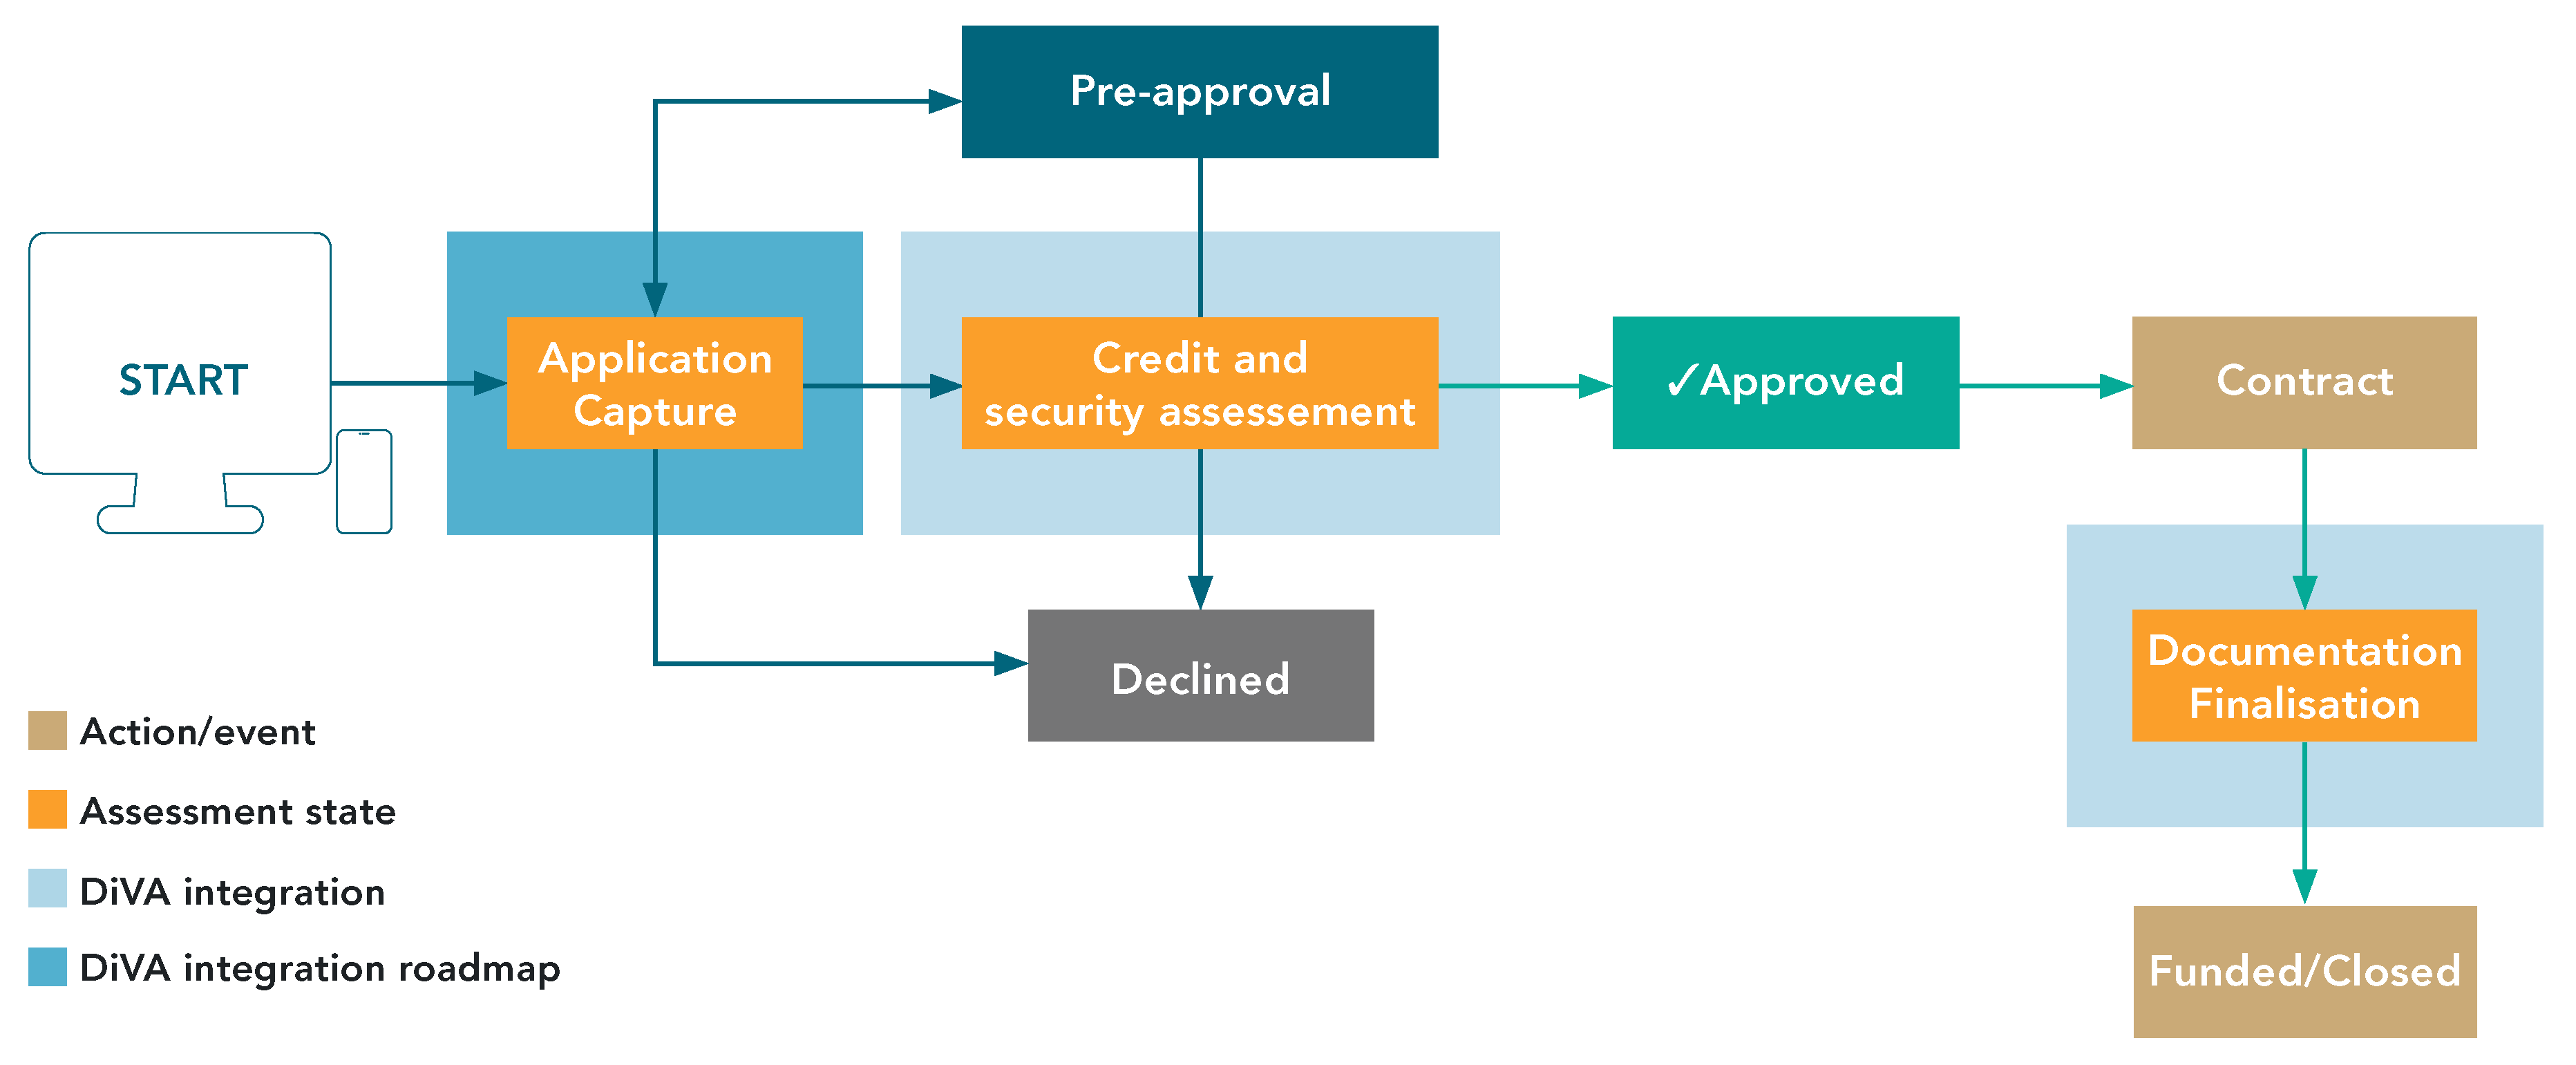 DiVA Integraion in Loan Orgination Workflow_No Title_Transparent